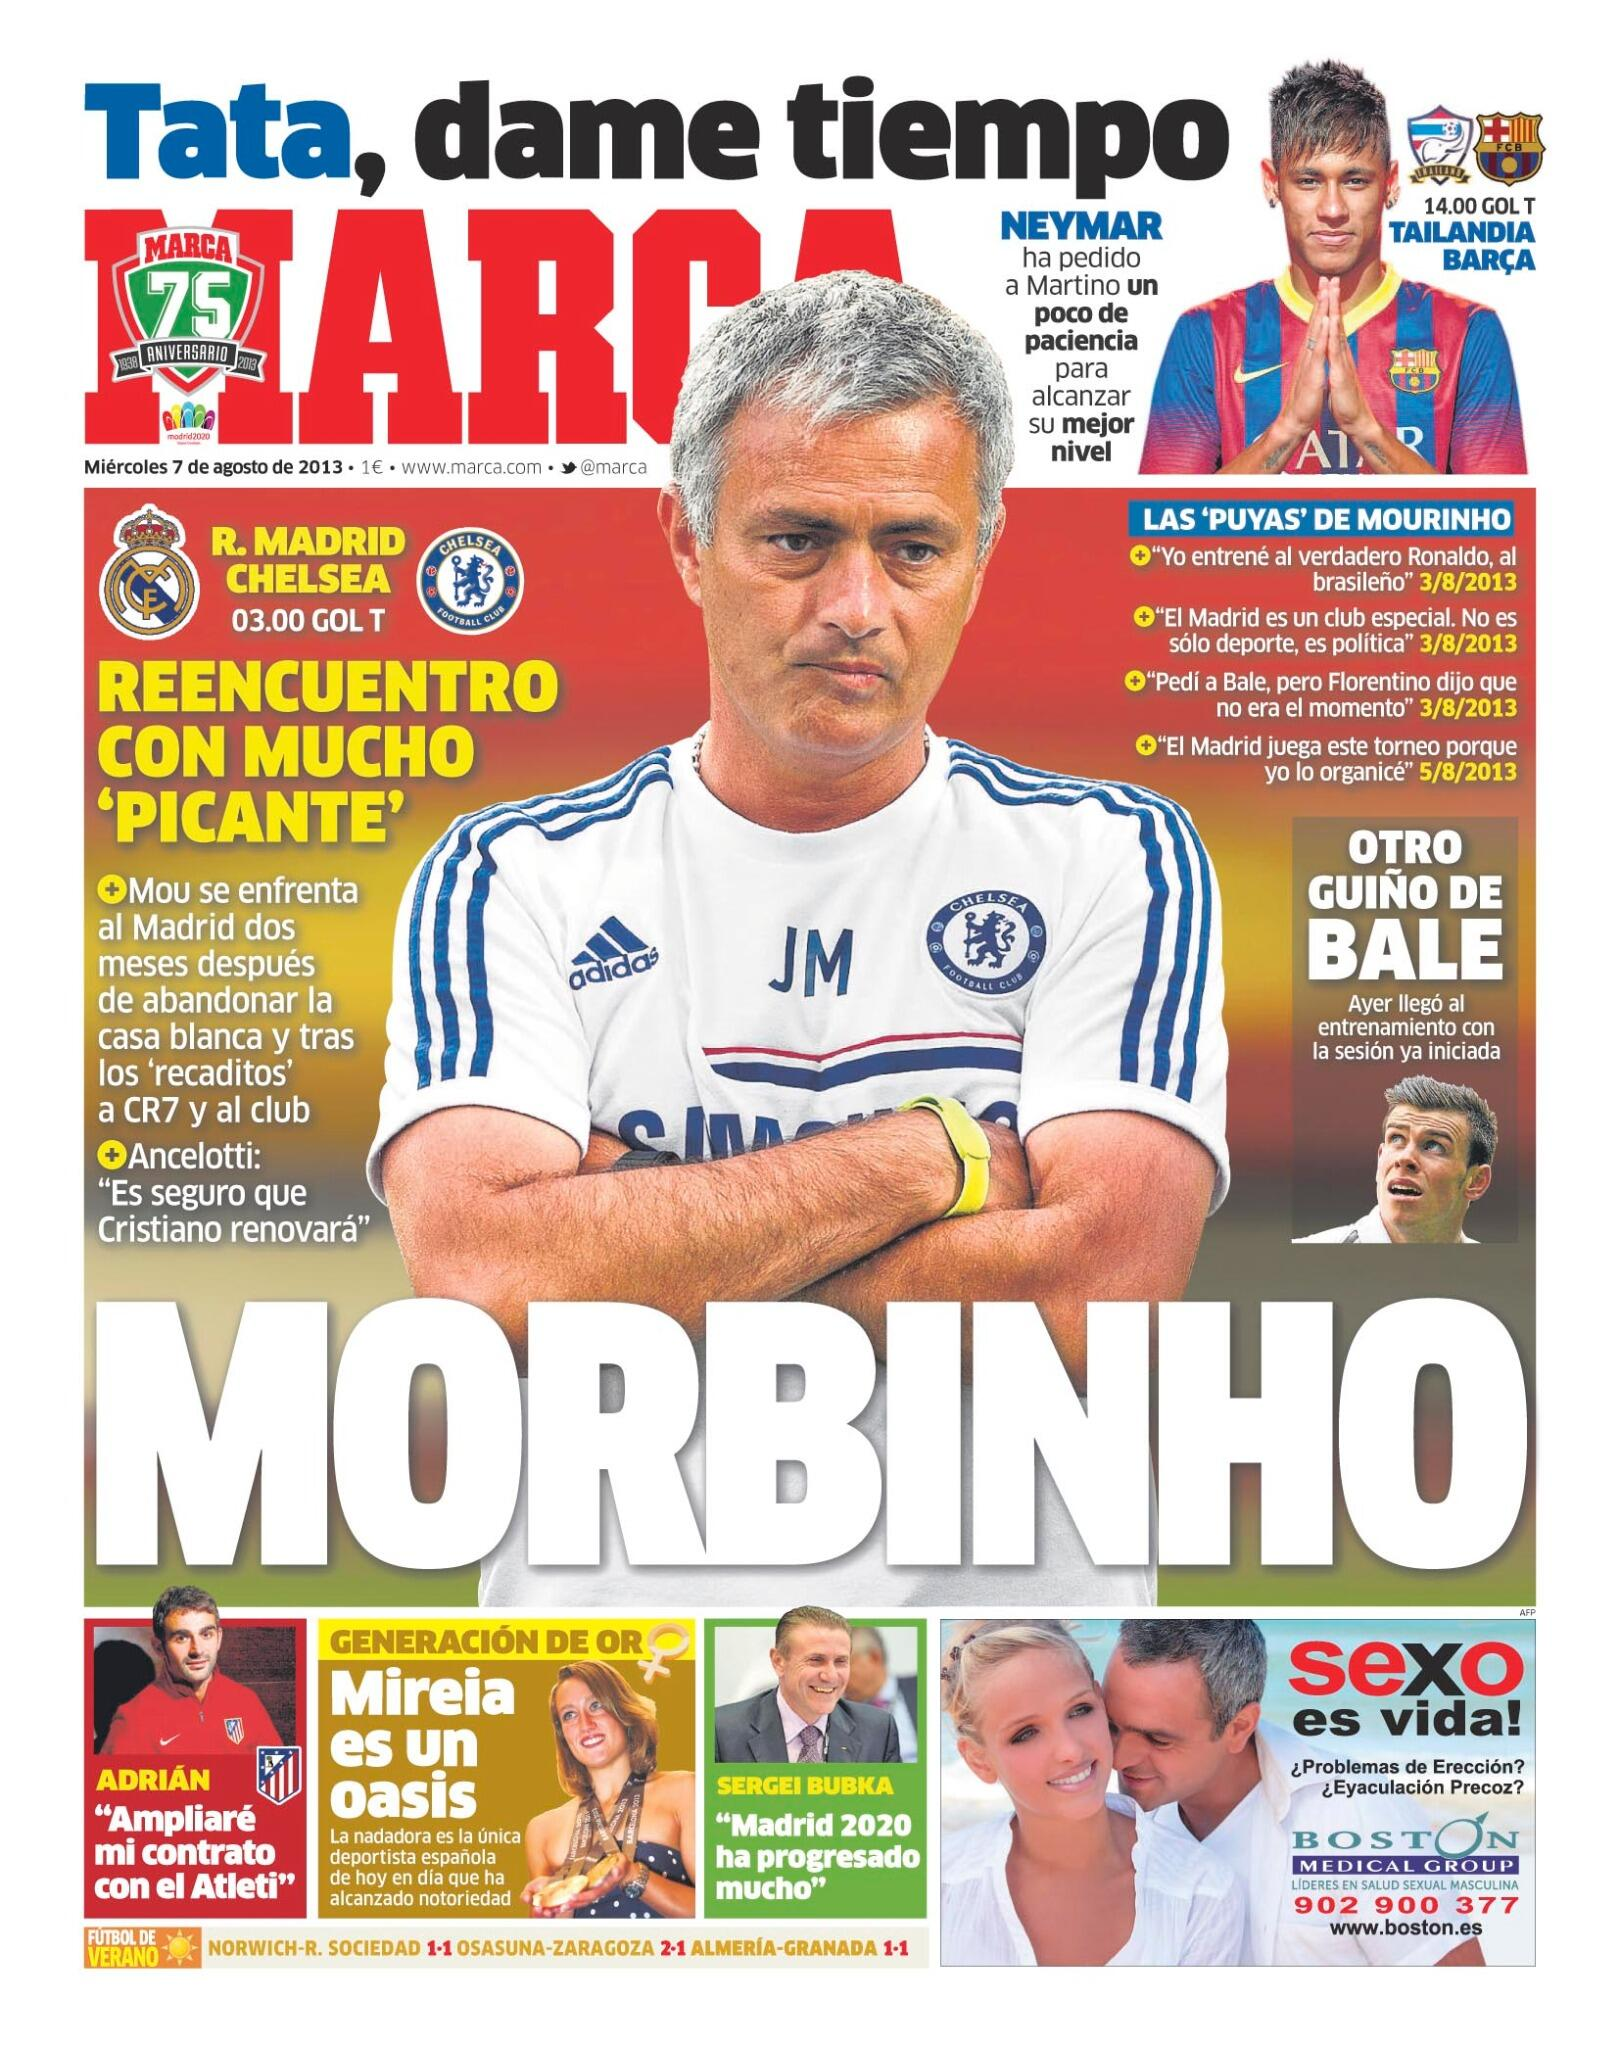 #LaPortada 'Morbinho' http://t.co/mcPgEZzw4v